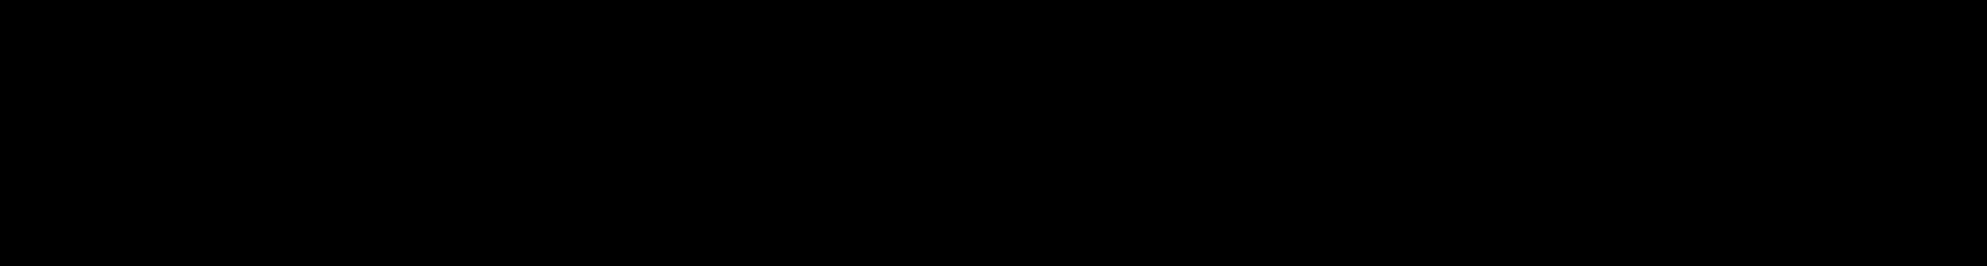 mlr-formula